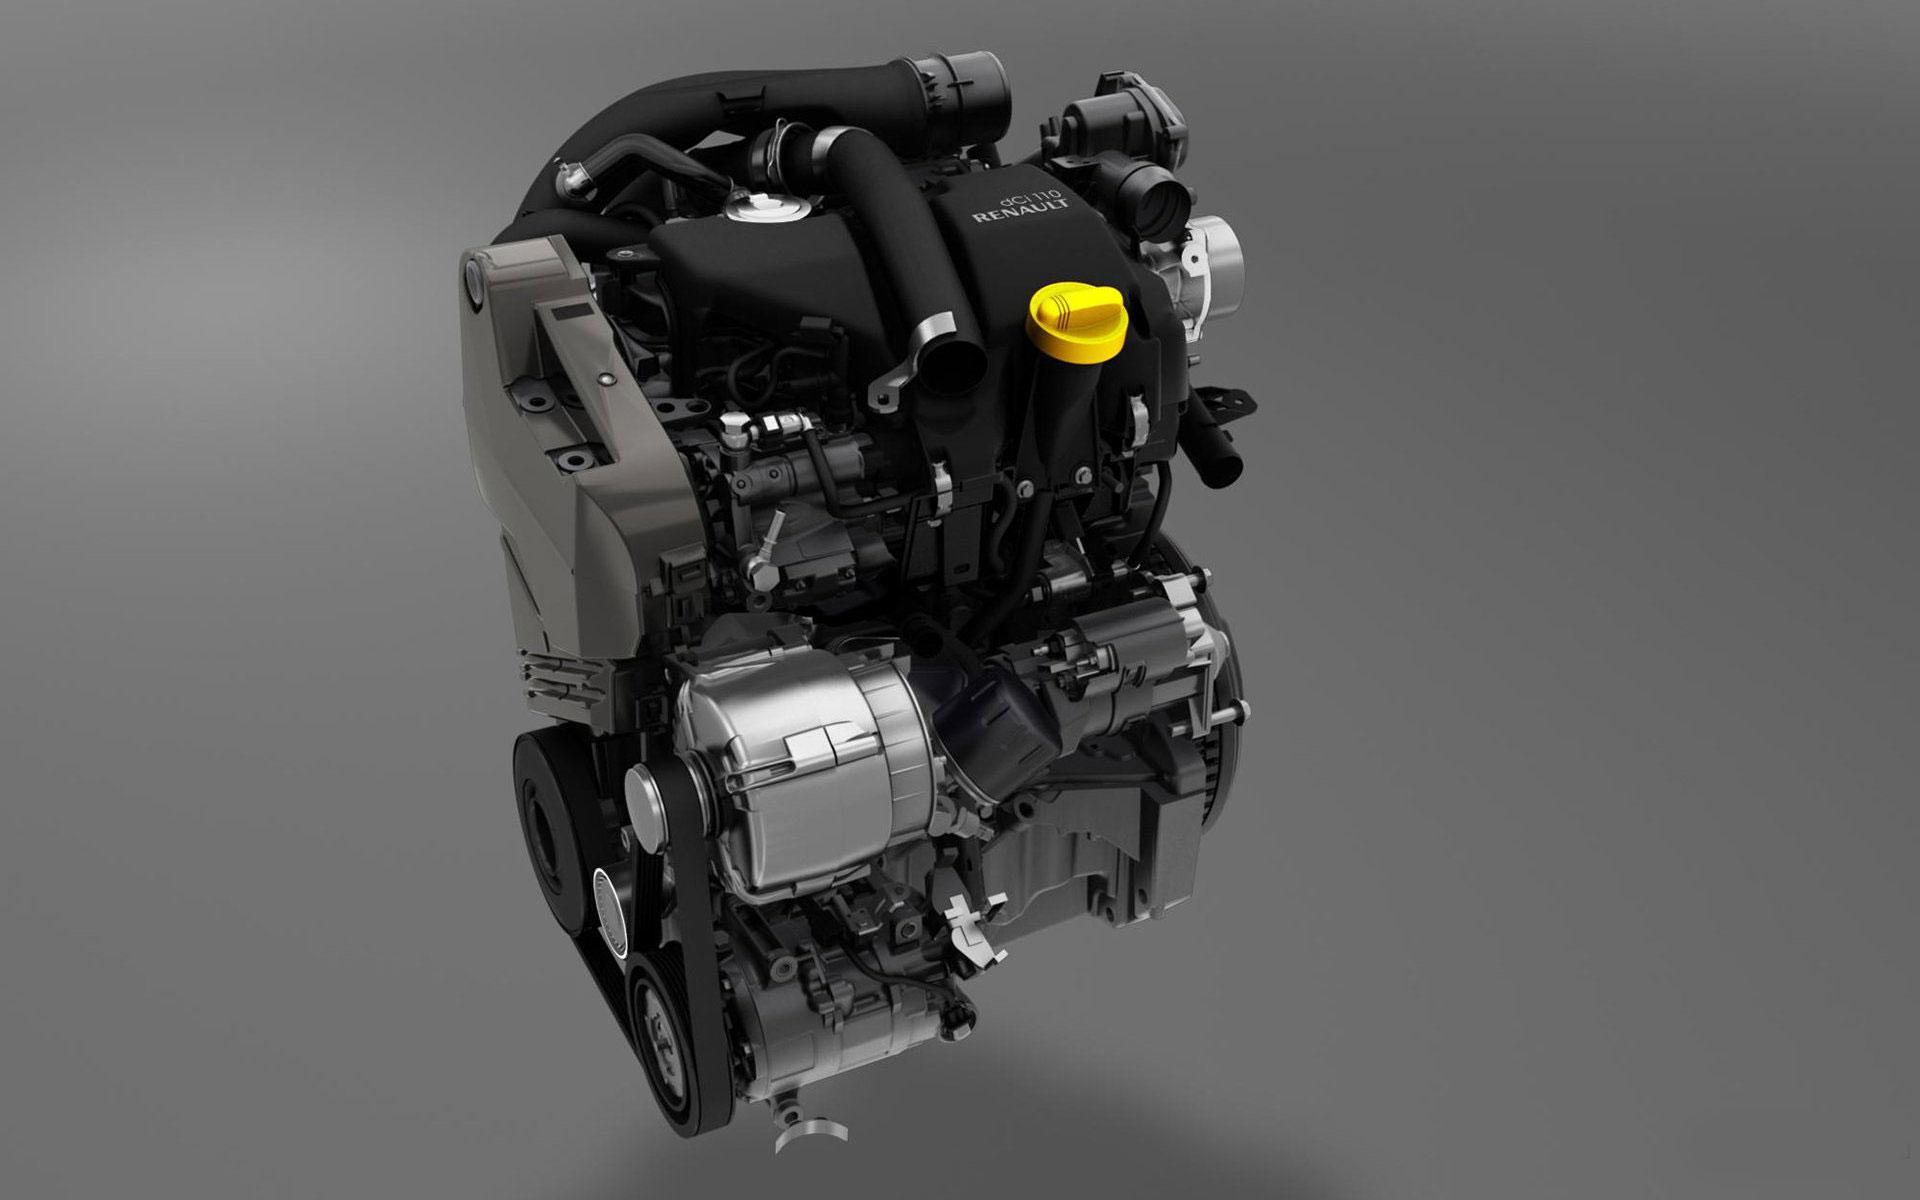 Рено Дастер моторесурс двигателя